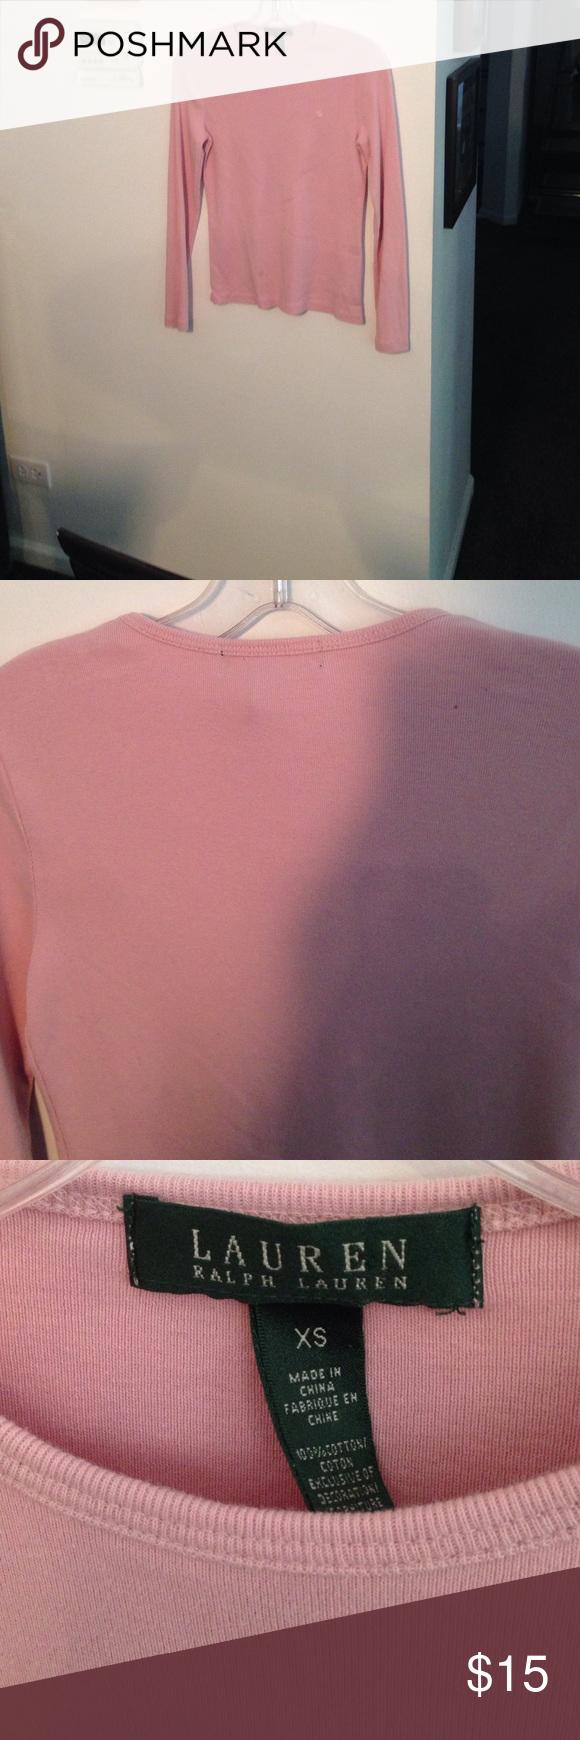 Ralph Lauren Long sleeve T soft pink logo front Excellent ...